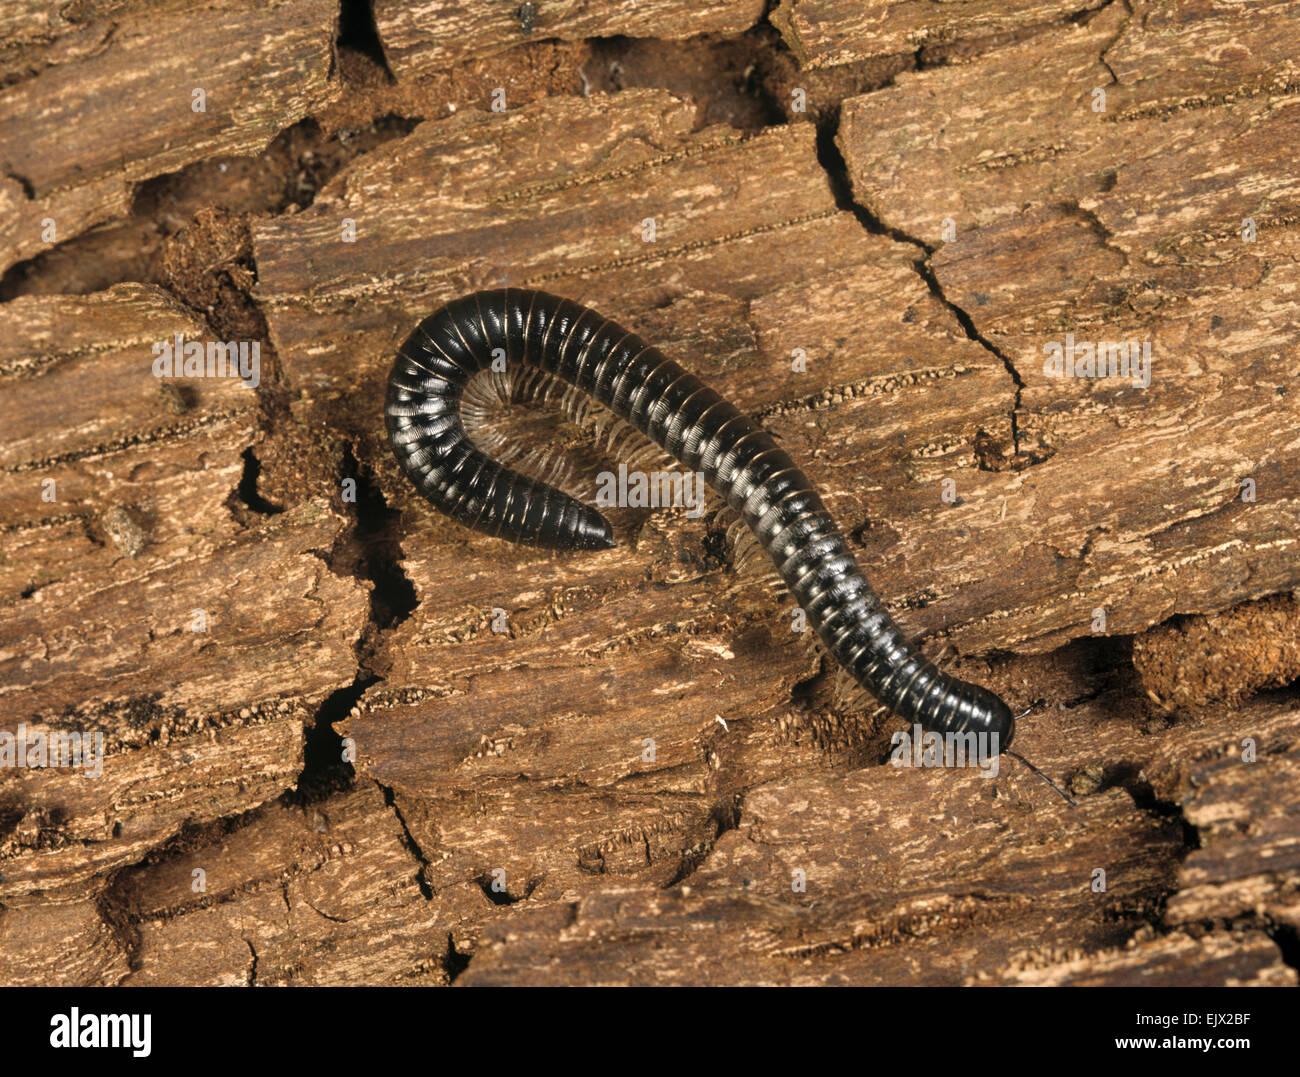 The Black Millipede - Tachypodoiulus niger - Stock Image